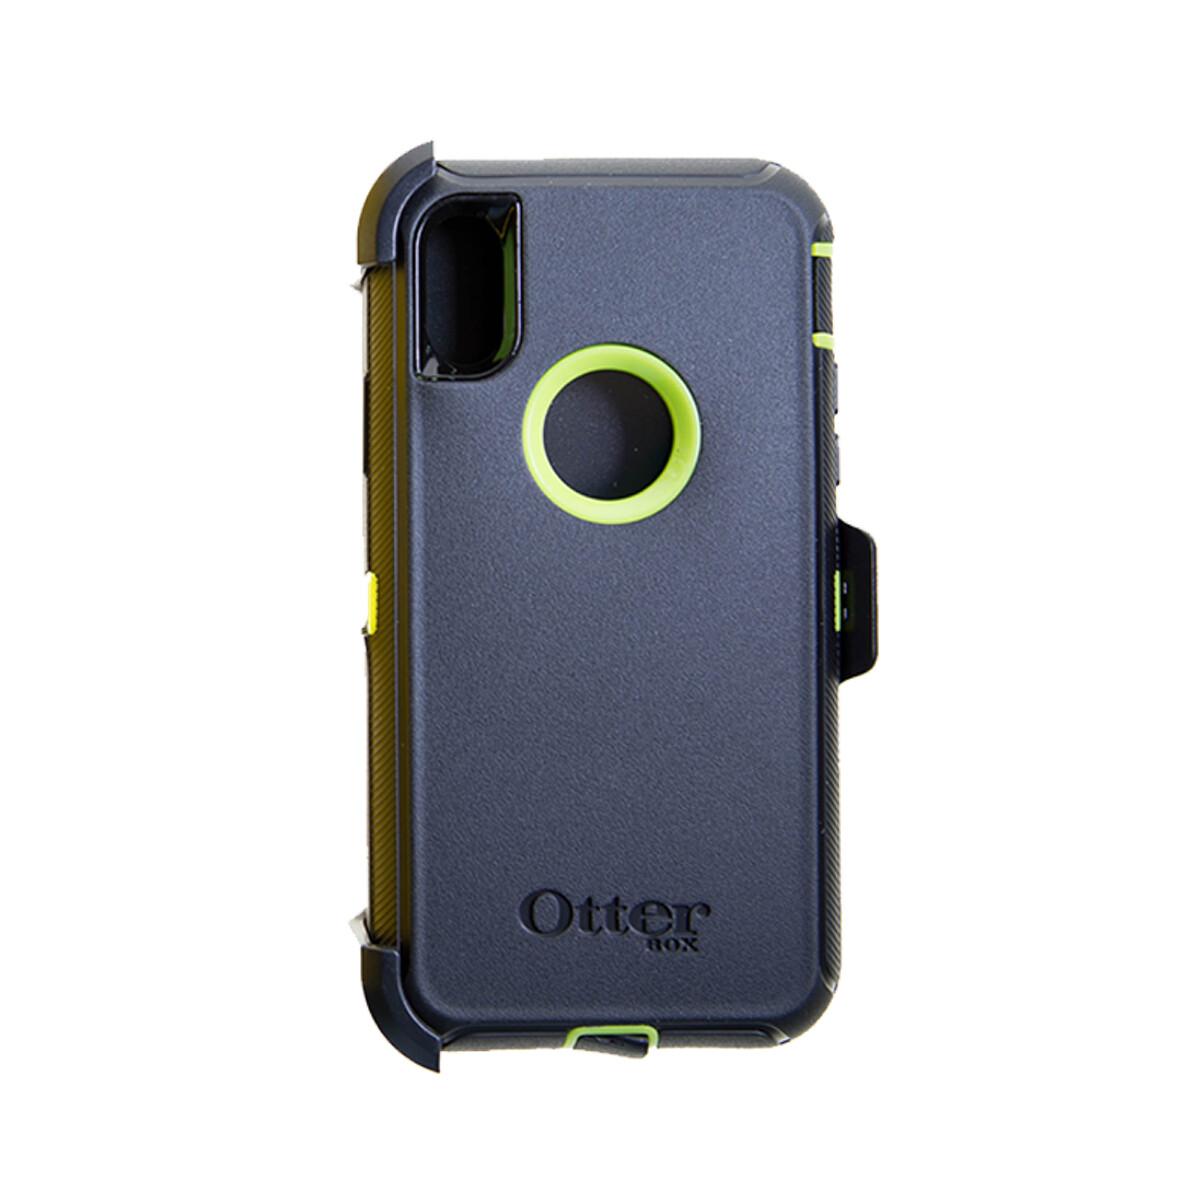 Estuche OTTERBOX Defender IPHONE X   XS (5.8) NEGRO   VERDE